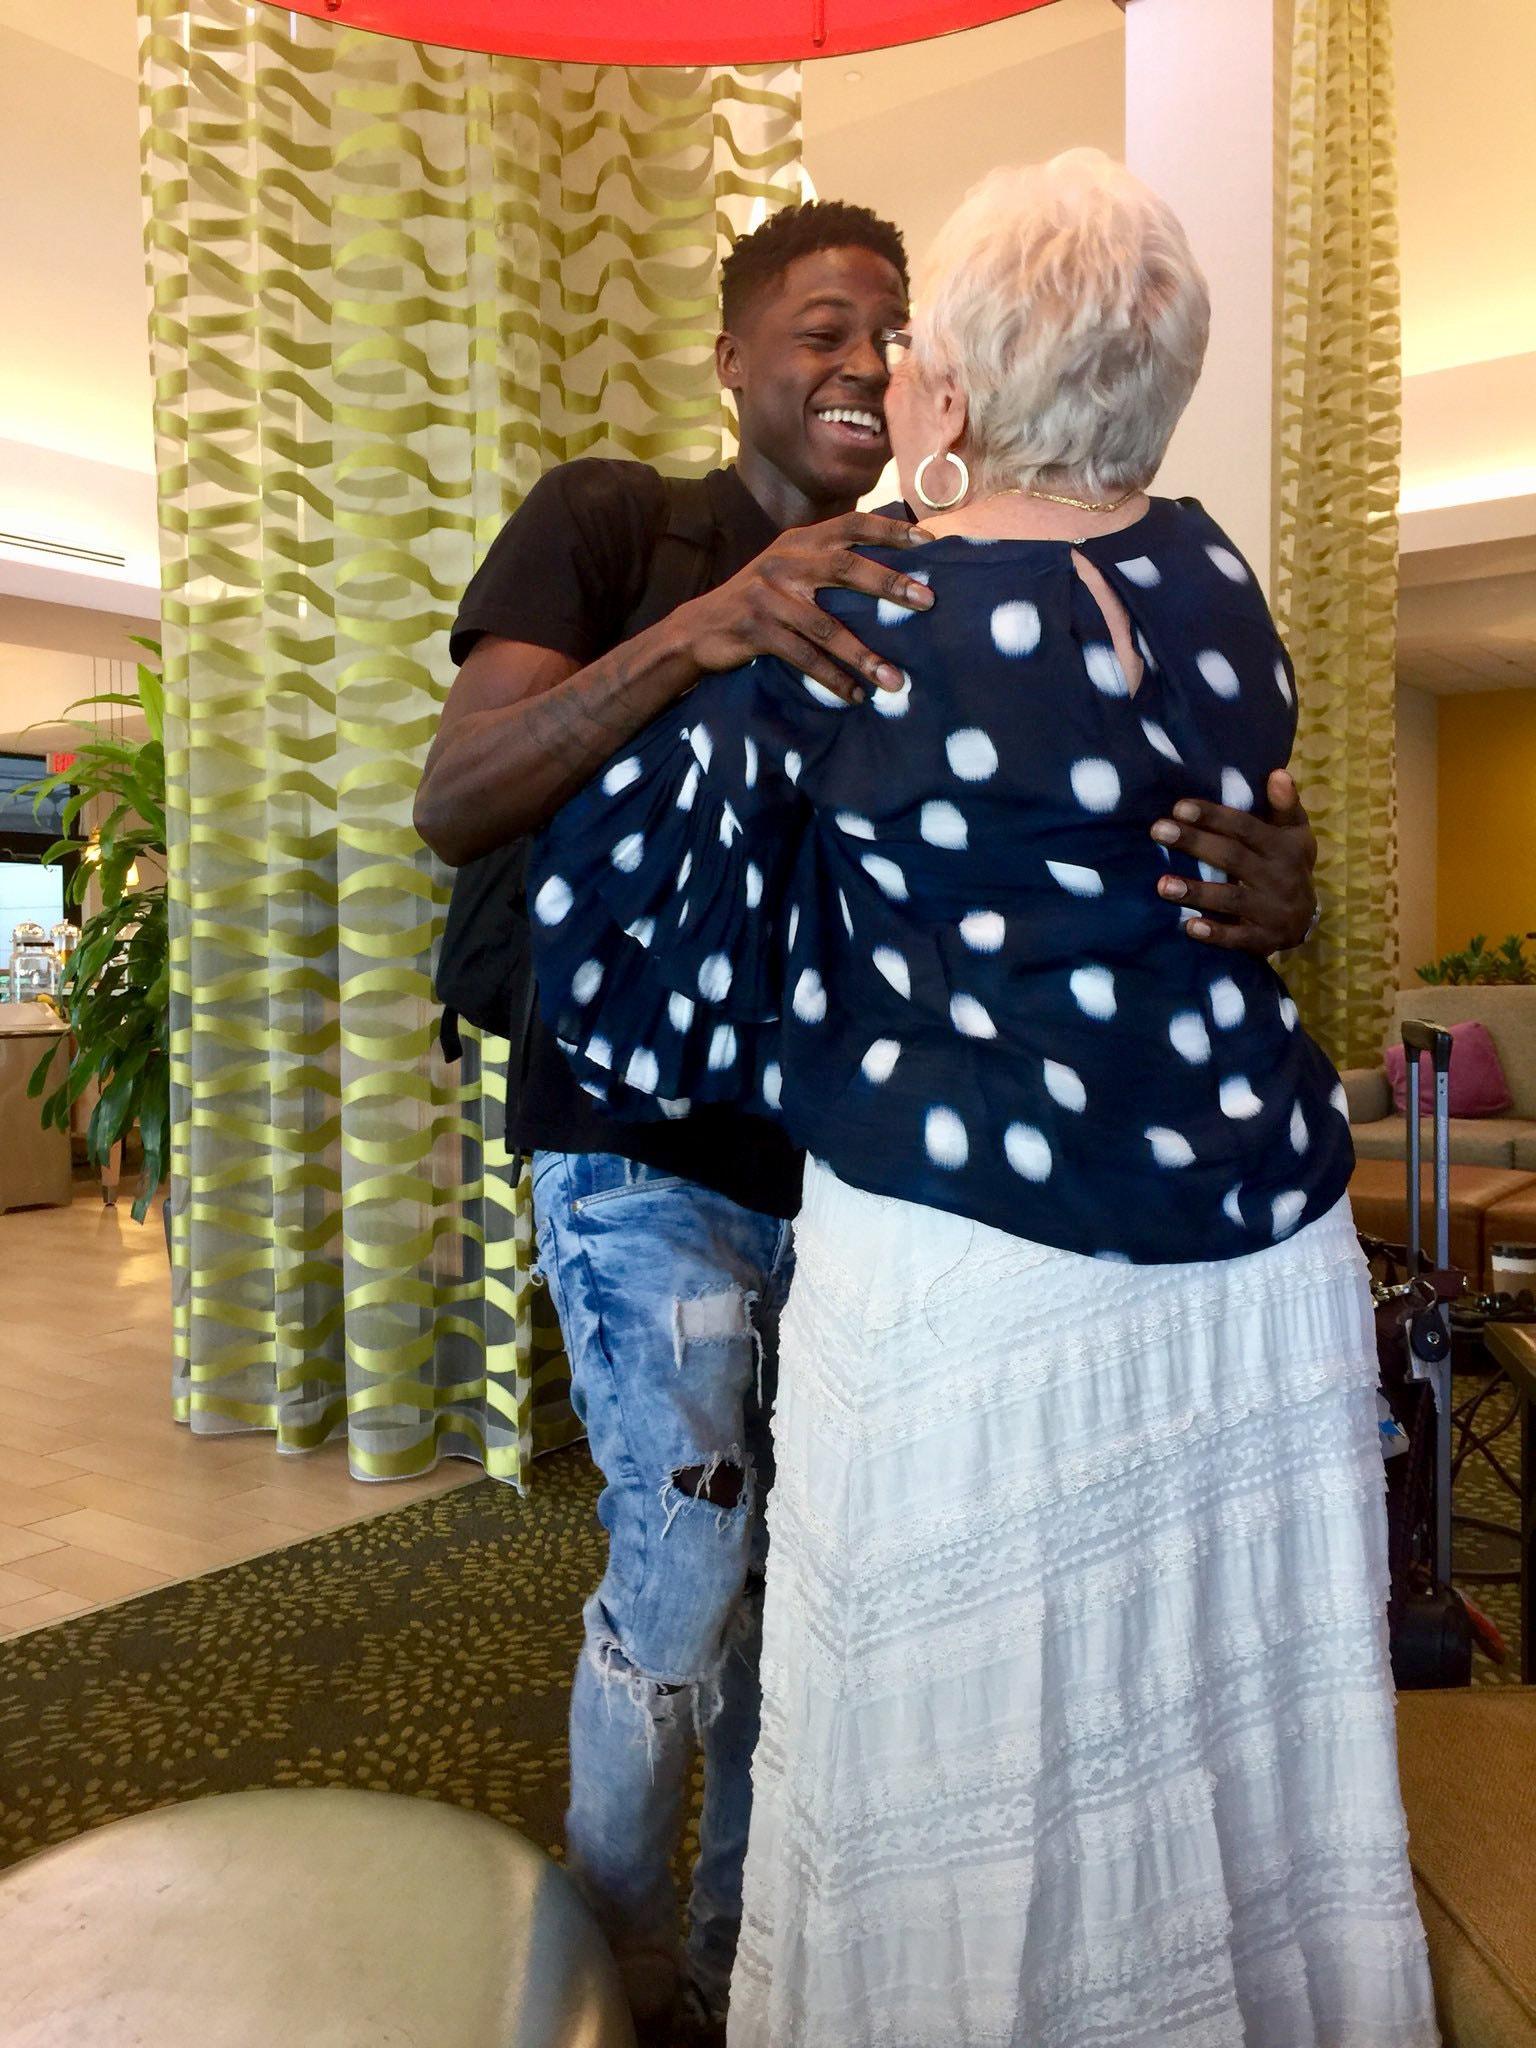 Spencer Sleyon meeting his online friend Rosalind Guttman in Florida last weekend. (Photo Rev. Amy Butler)